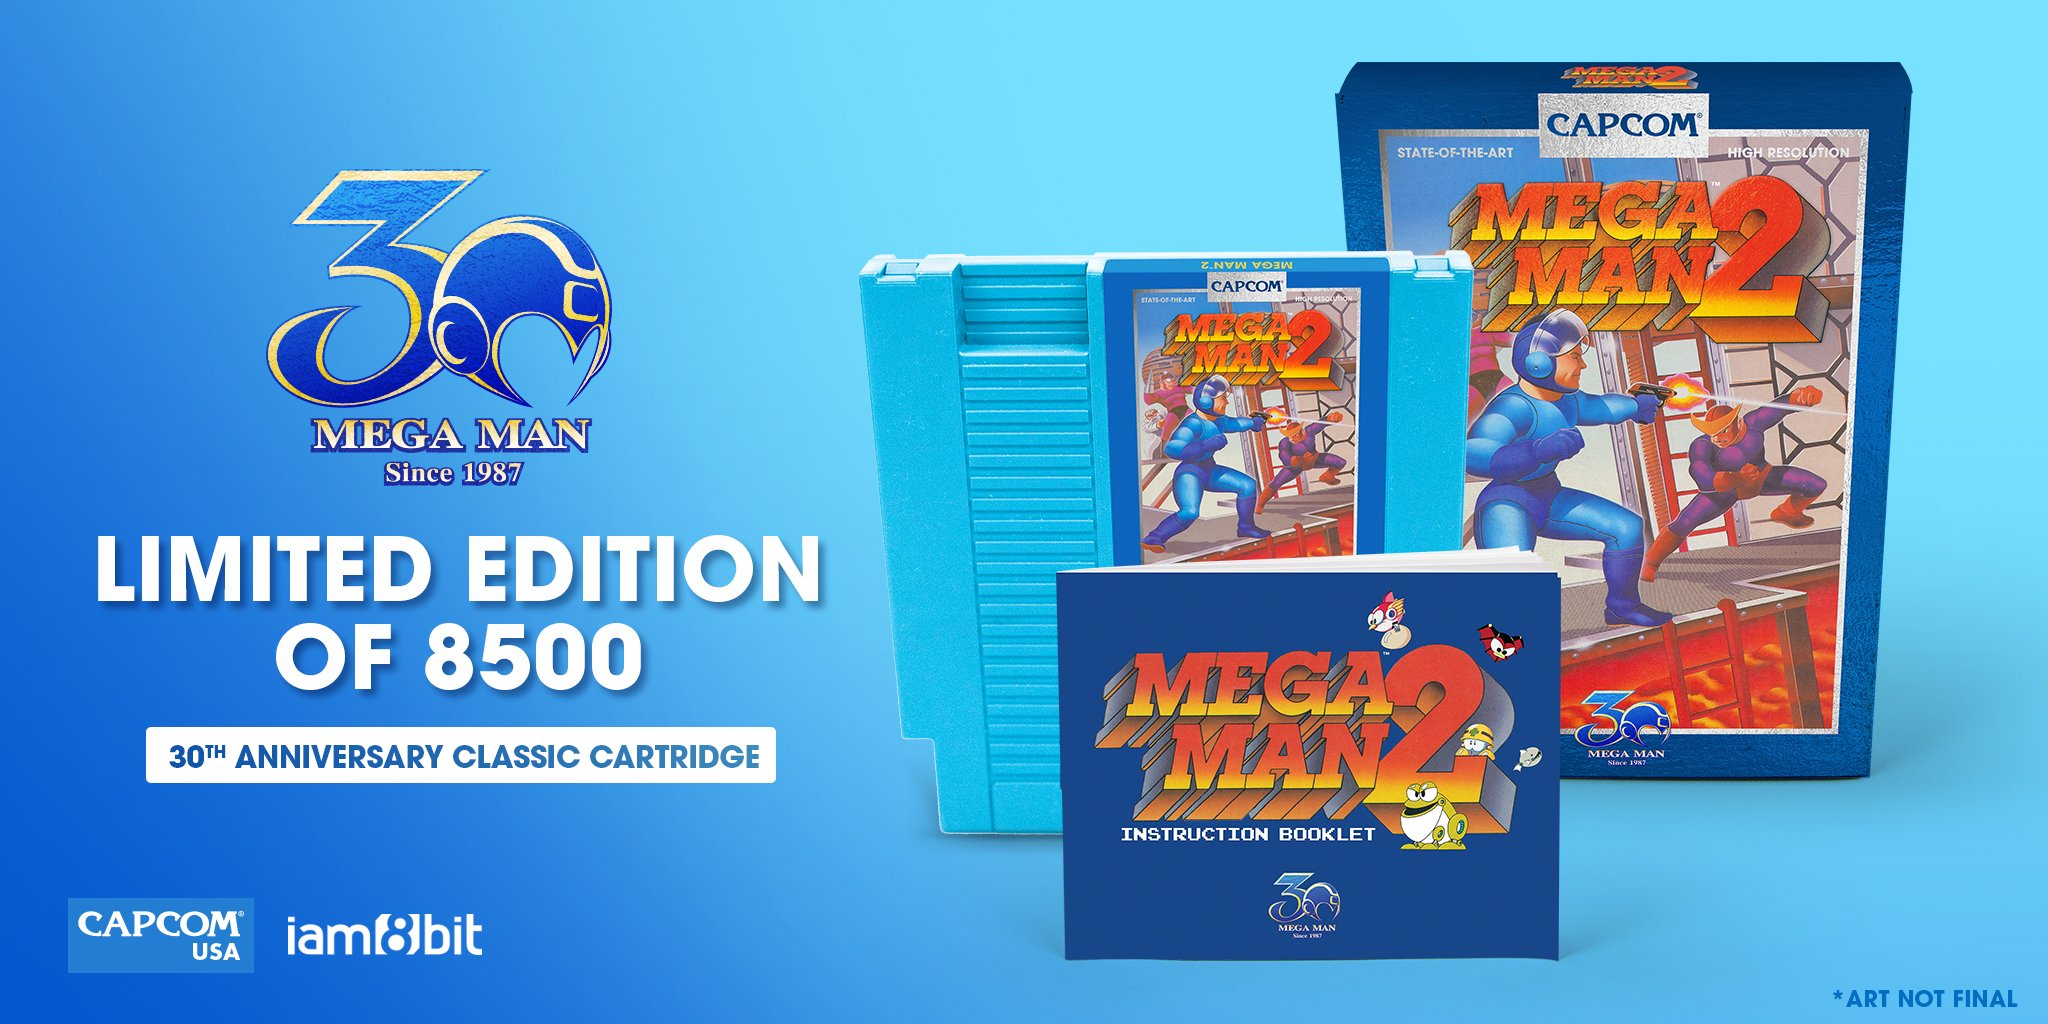 03-Mega_Man_2-30th_Anniversary_Classic_Cartridge.JPG